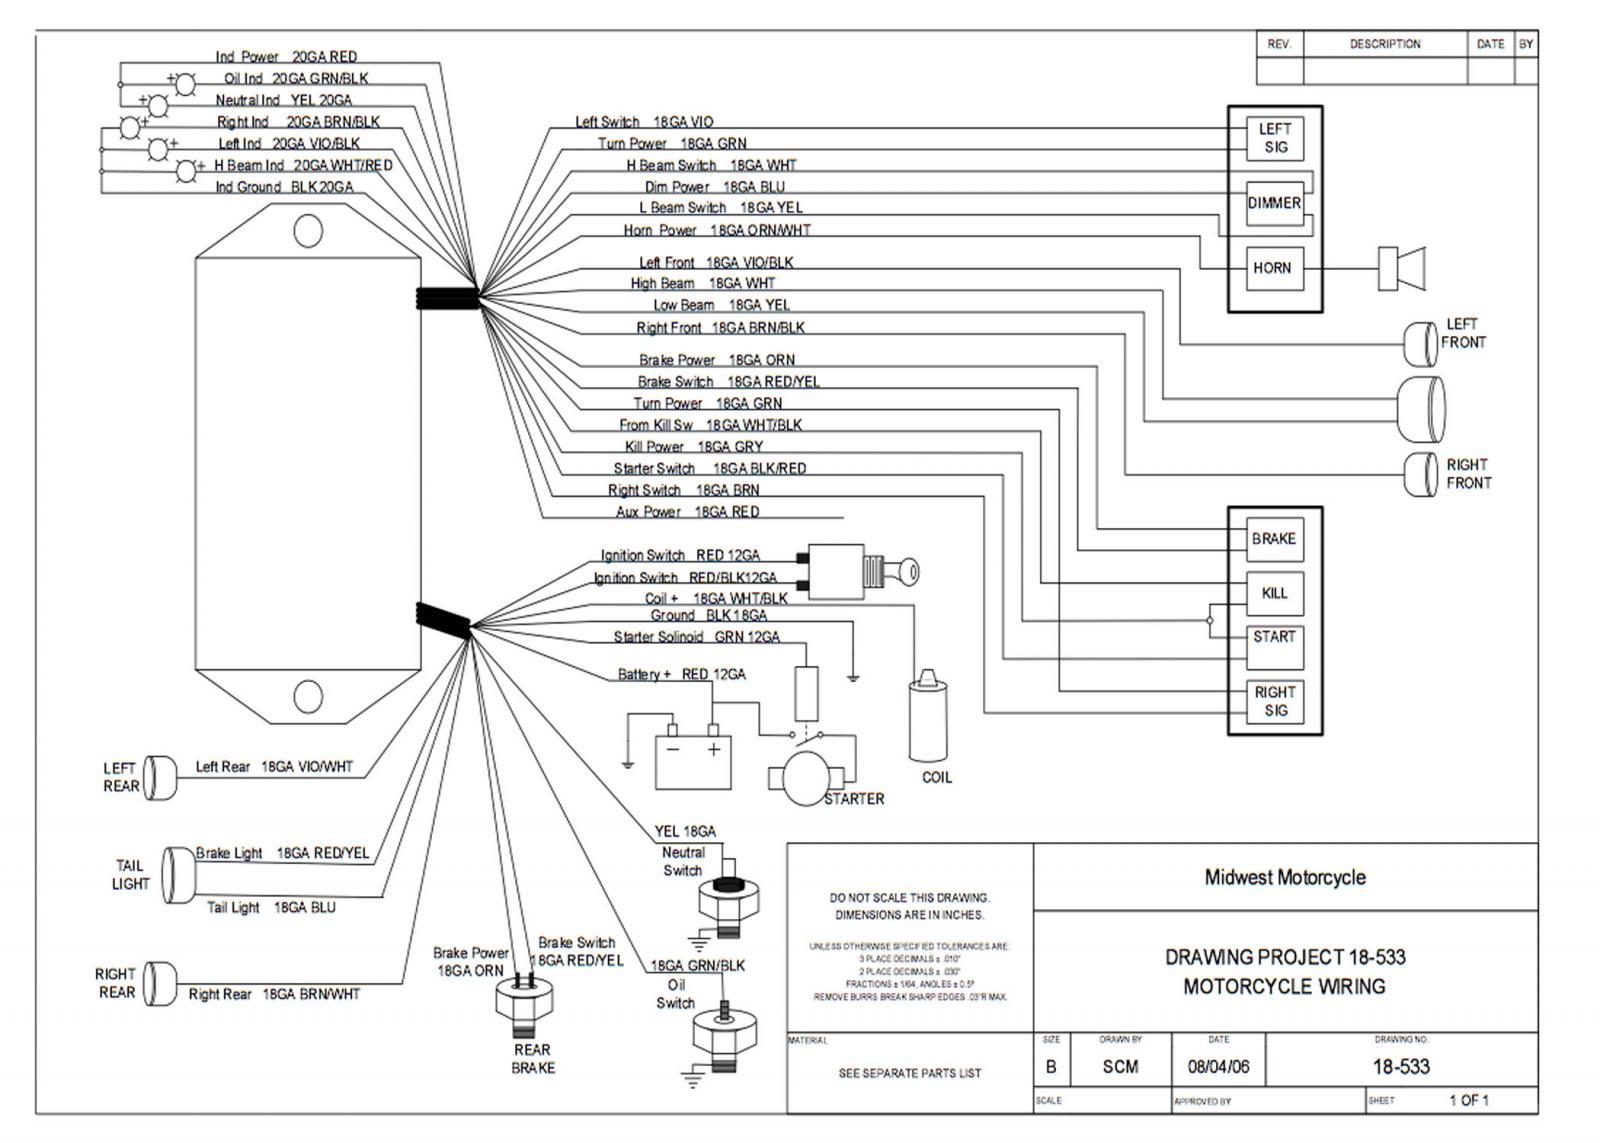 dyna s wiring diagram 94 ford ranger radio single fire ignition imageresizertool com